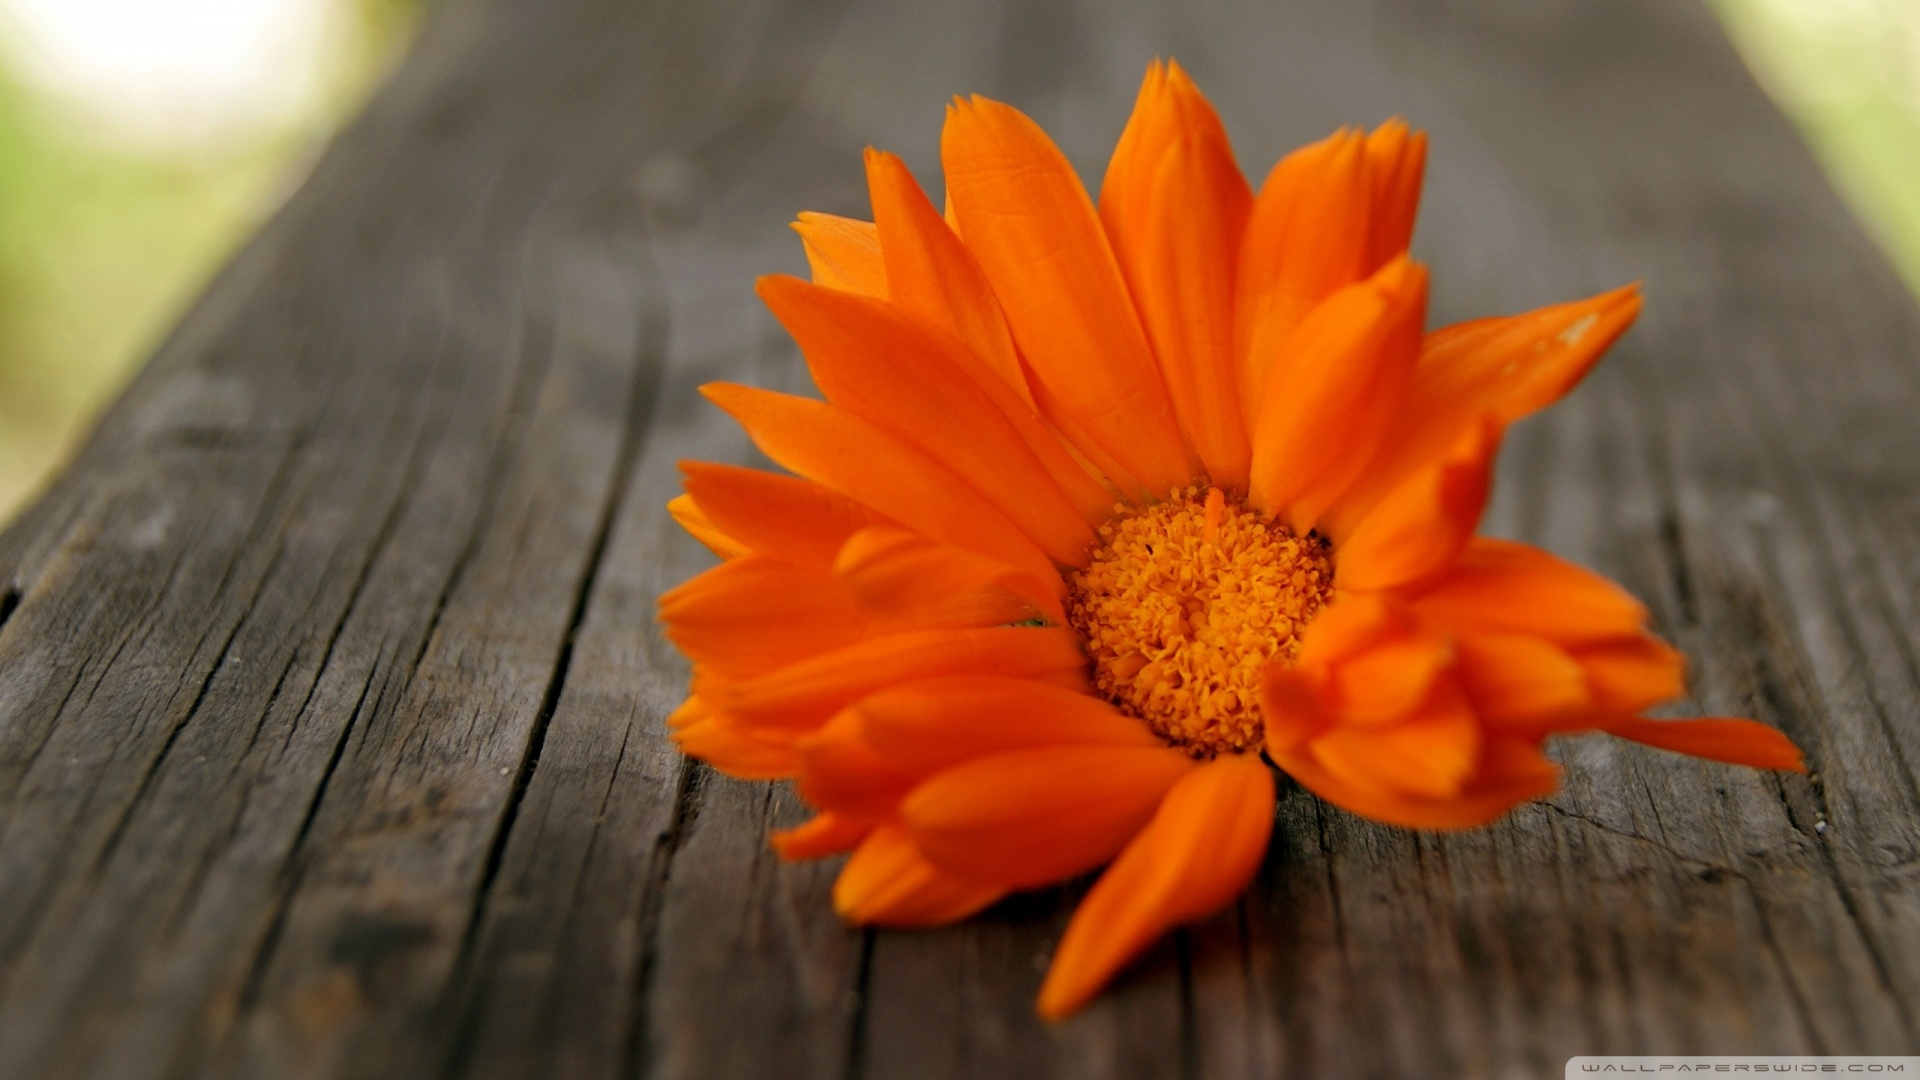 Orange Flower HD